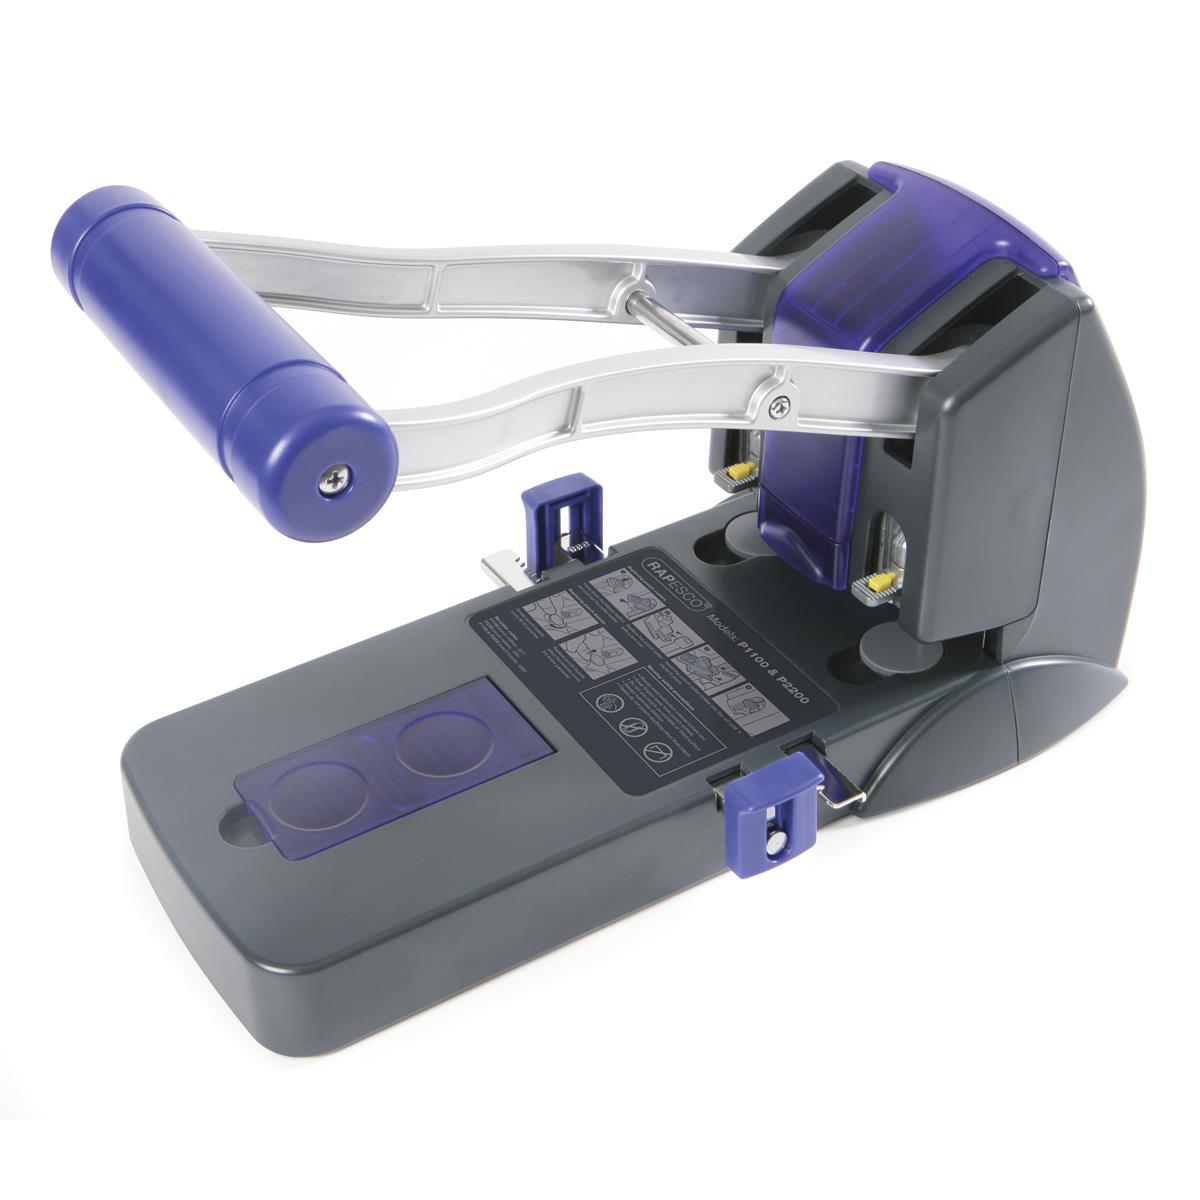 Rapesco 2200 Punch Heavy-duty 2-Hole Capacity 150x 80gsm Black Ref PF220AP1